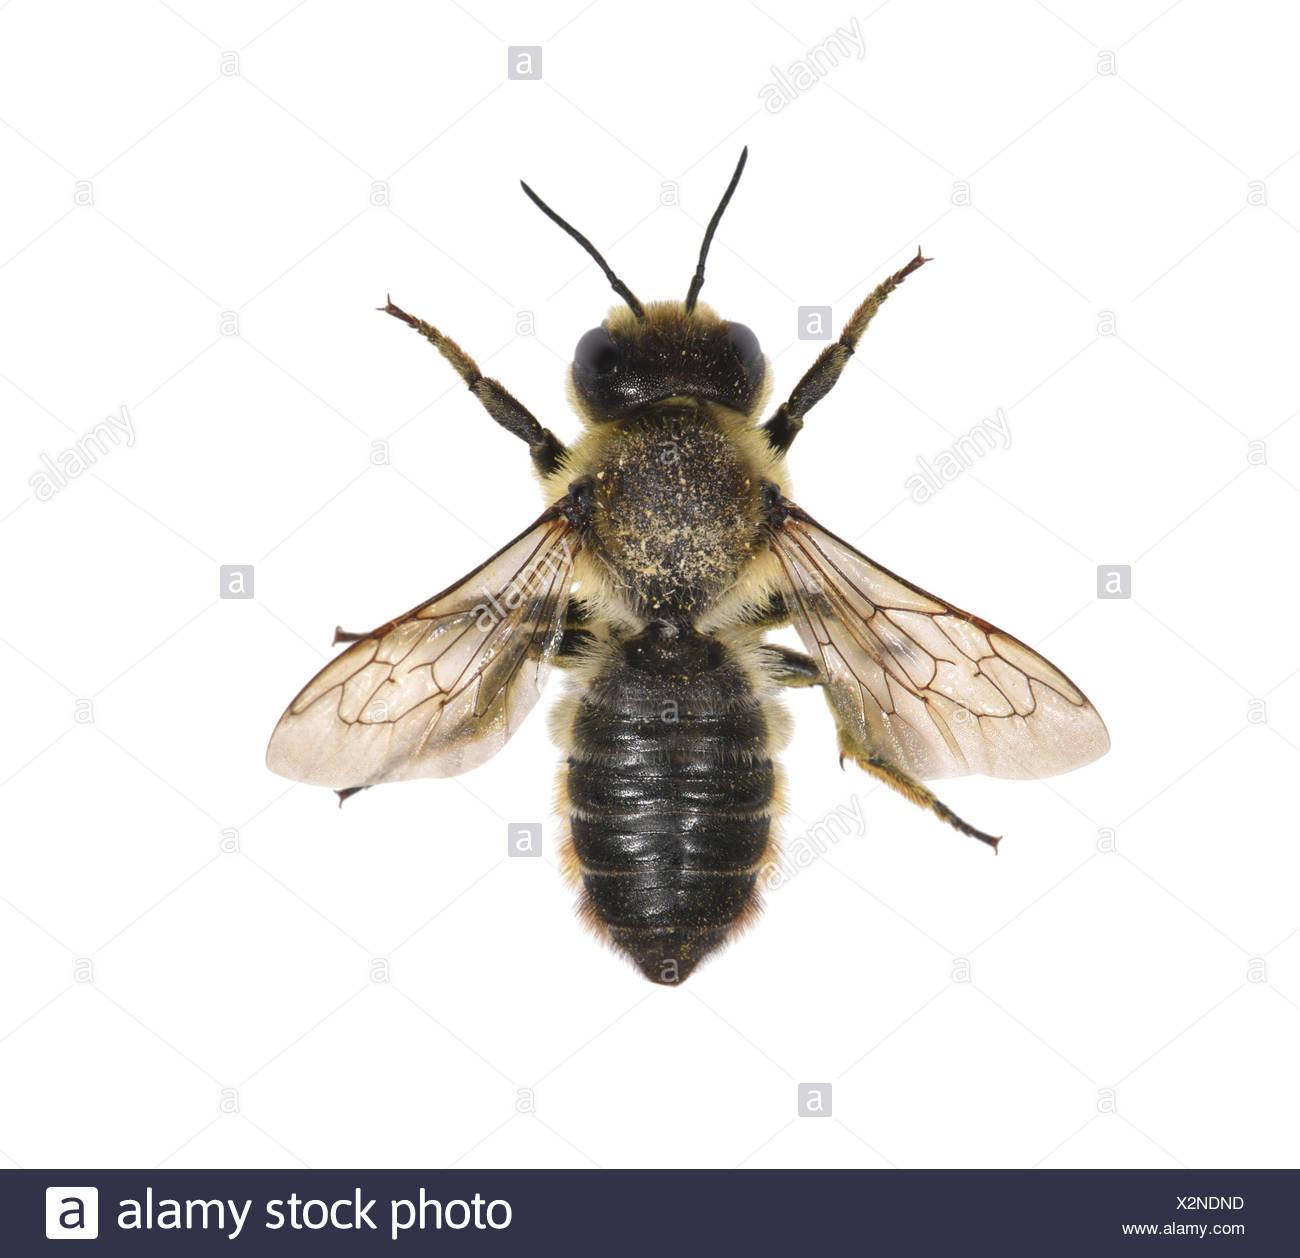 Leaf-cutter Bee - Megachile centucularis - Stock Image